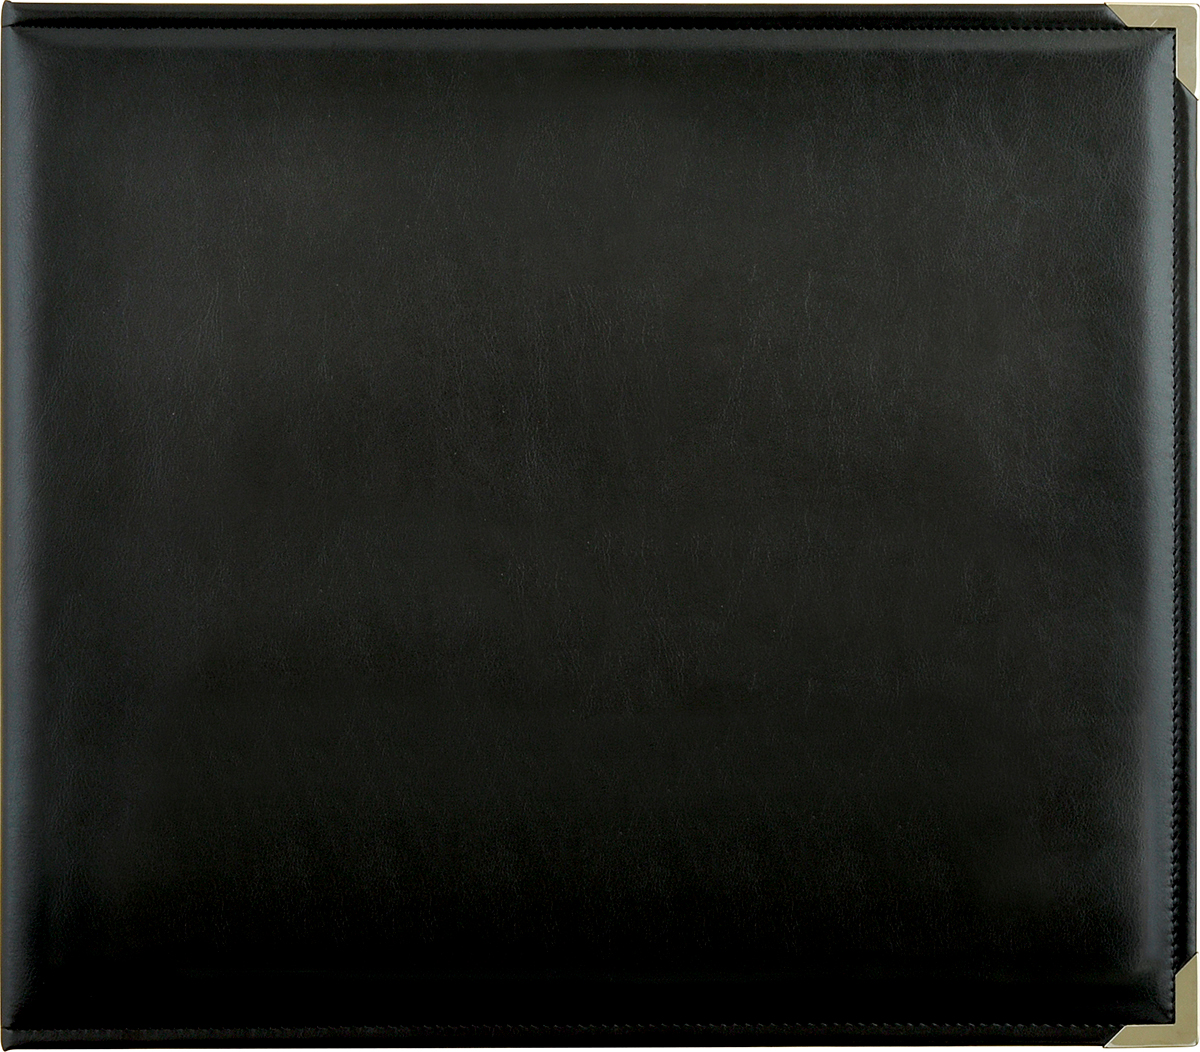 Kaisercraft Leather D-Ring Album 12X12-Black